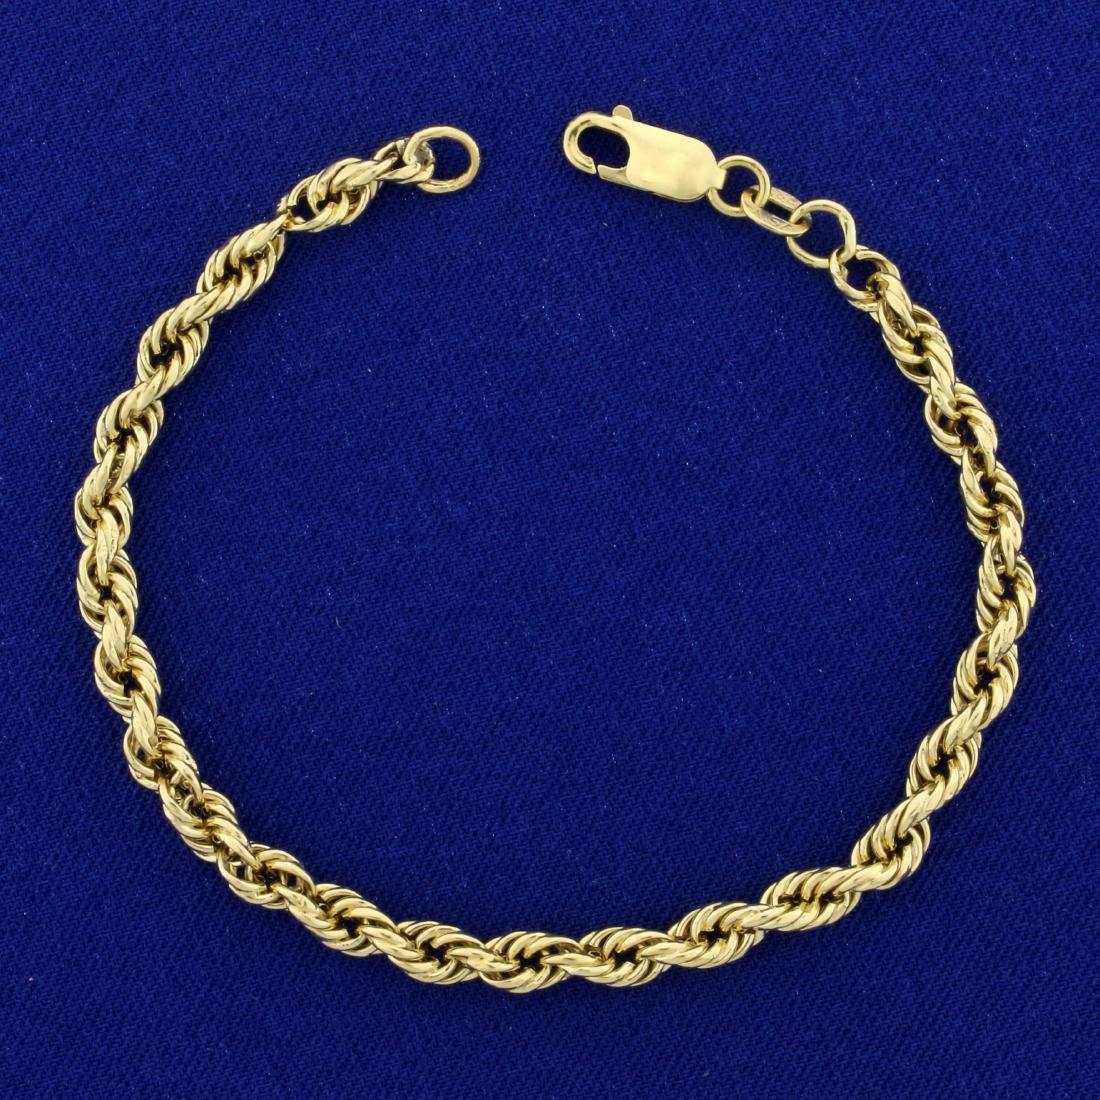 7 Inch Rope Bracelet in 14K Yellow Gold